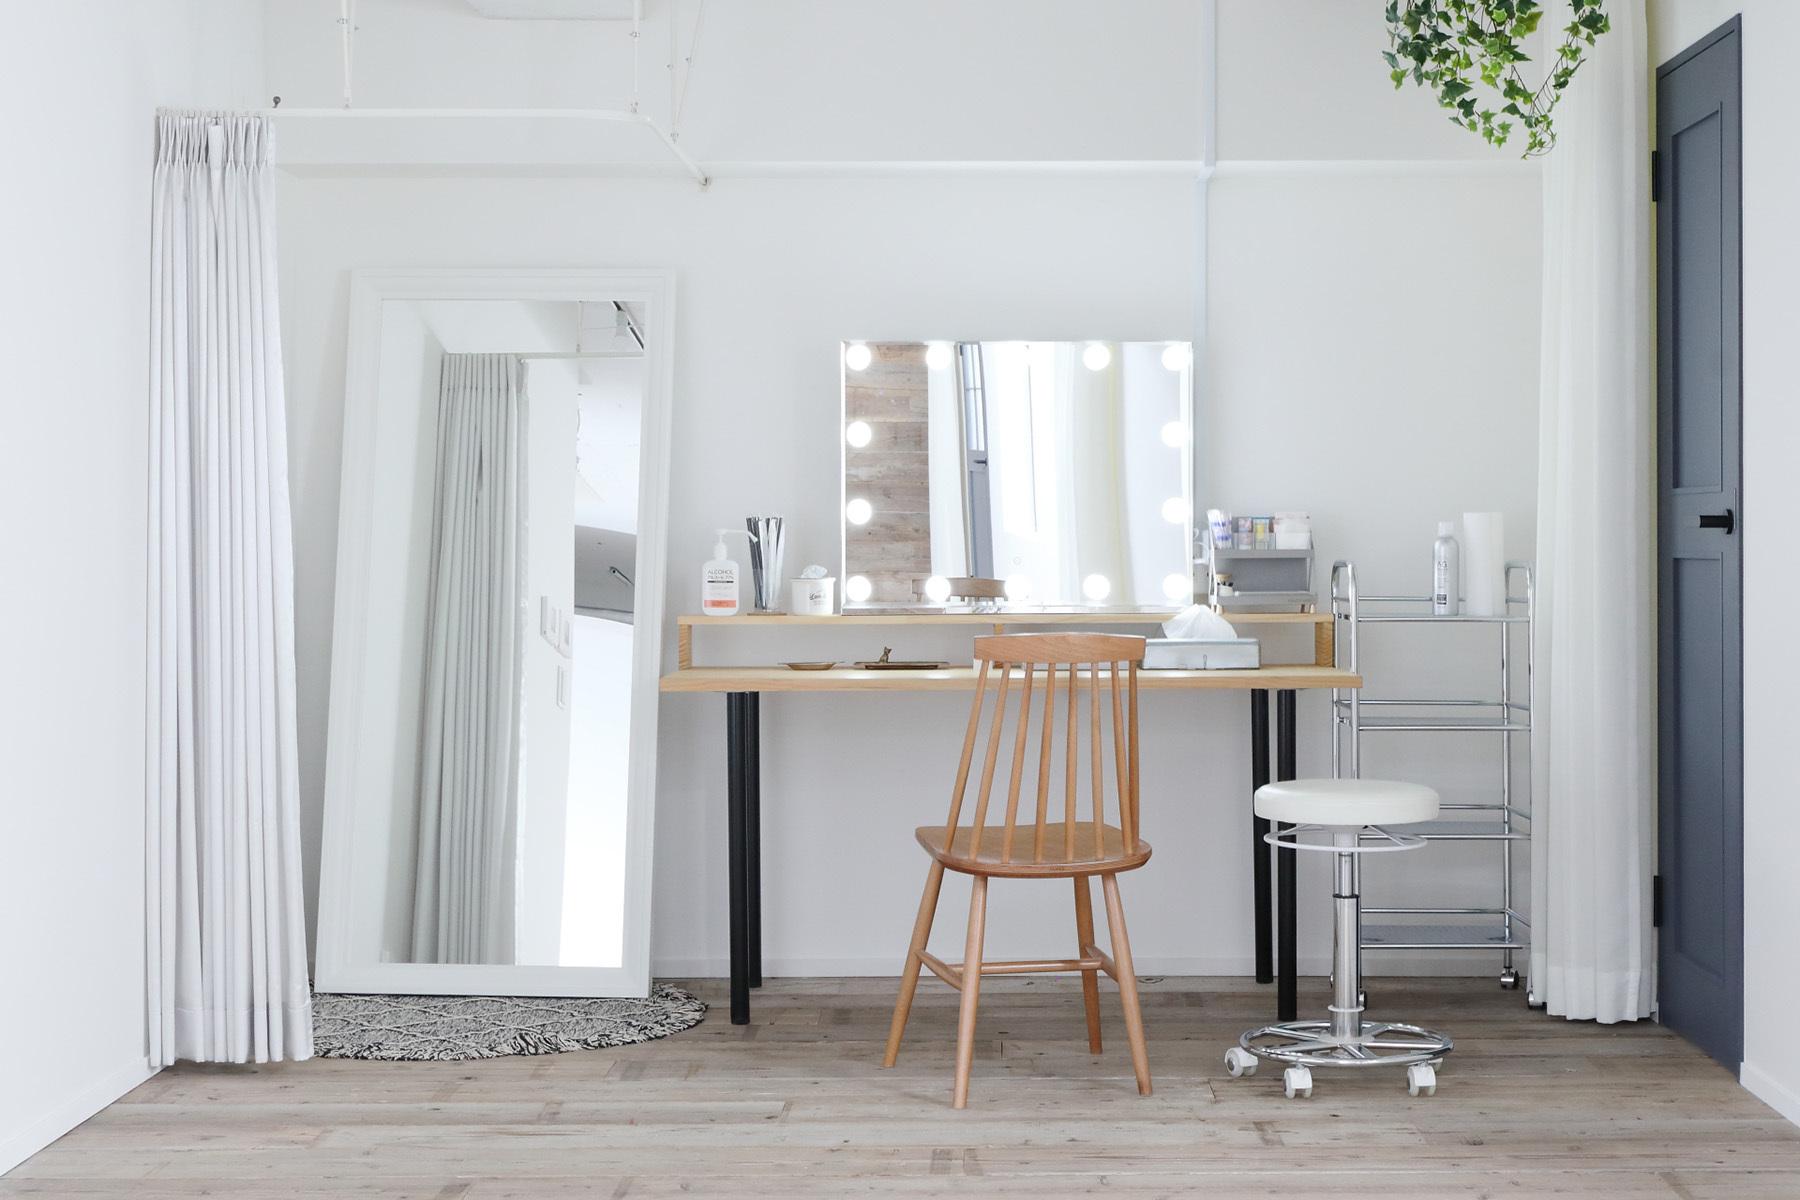 STUDIO FOXTAIL Bst (スタジオ フォックステイル Bst)4×8カポックなど撮影補助ツール